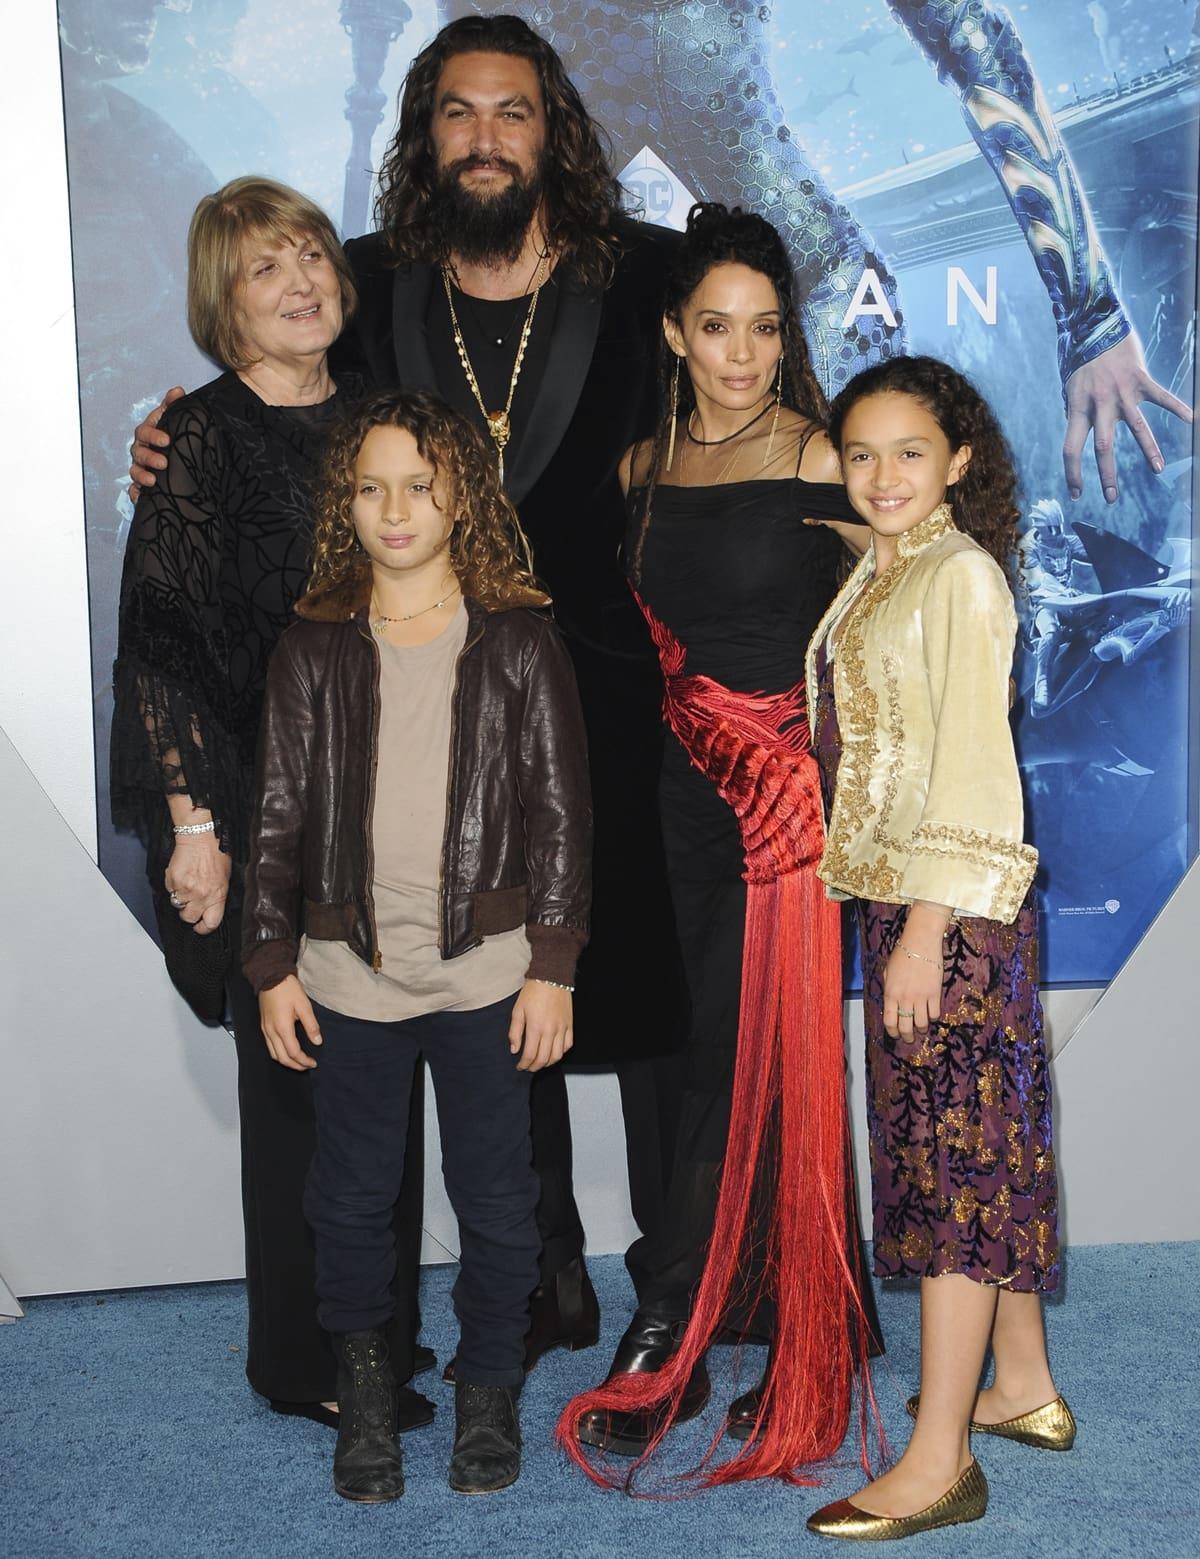 Jason Momoa with his mom Coni Momoa, his son Nakoa-Wolf Manakauapo Namakaeha Momoa, his wife Lisa Bonet, and his daughter Lola Iolani Momoa